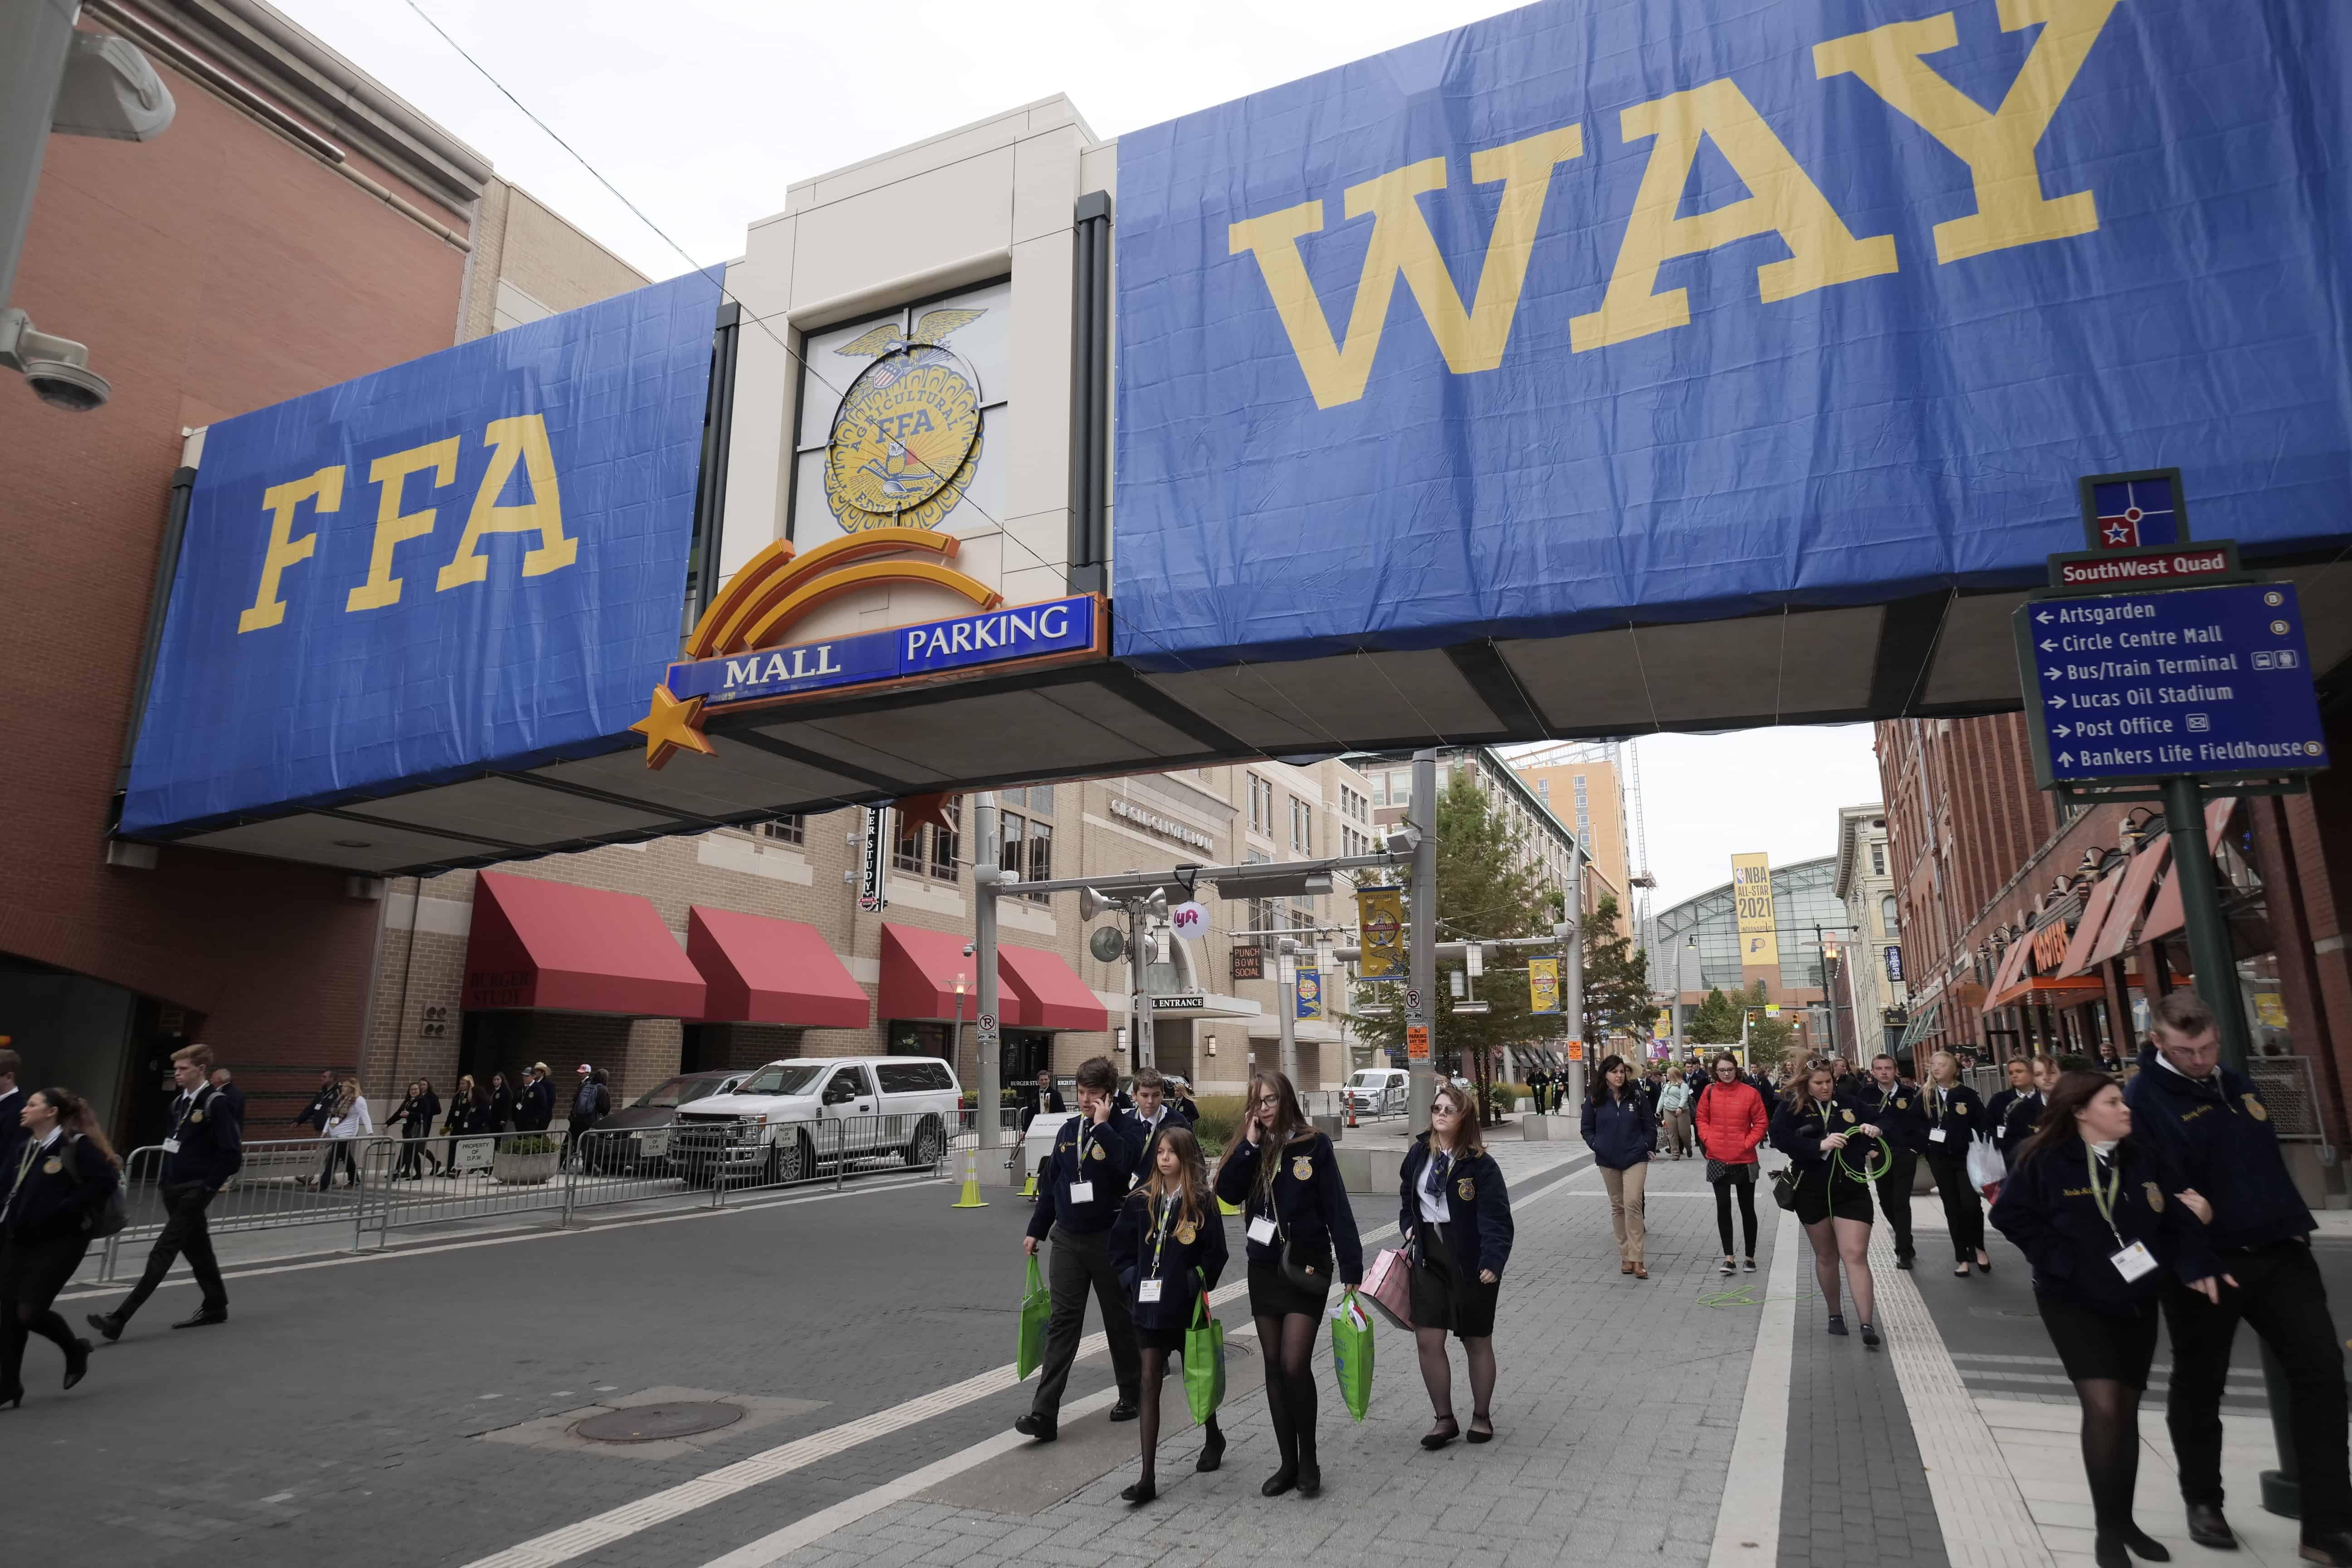 FFA members walk along FFA Way in Indianapolis.